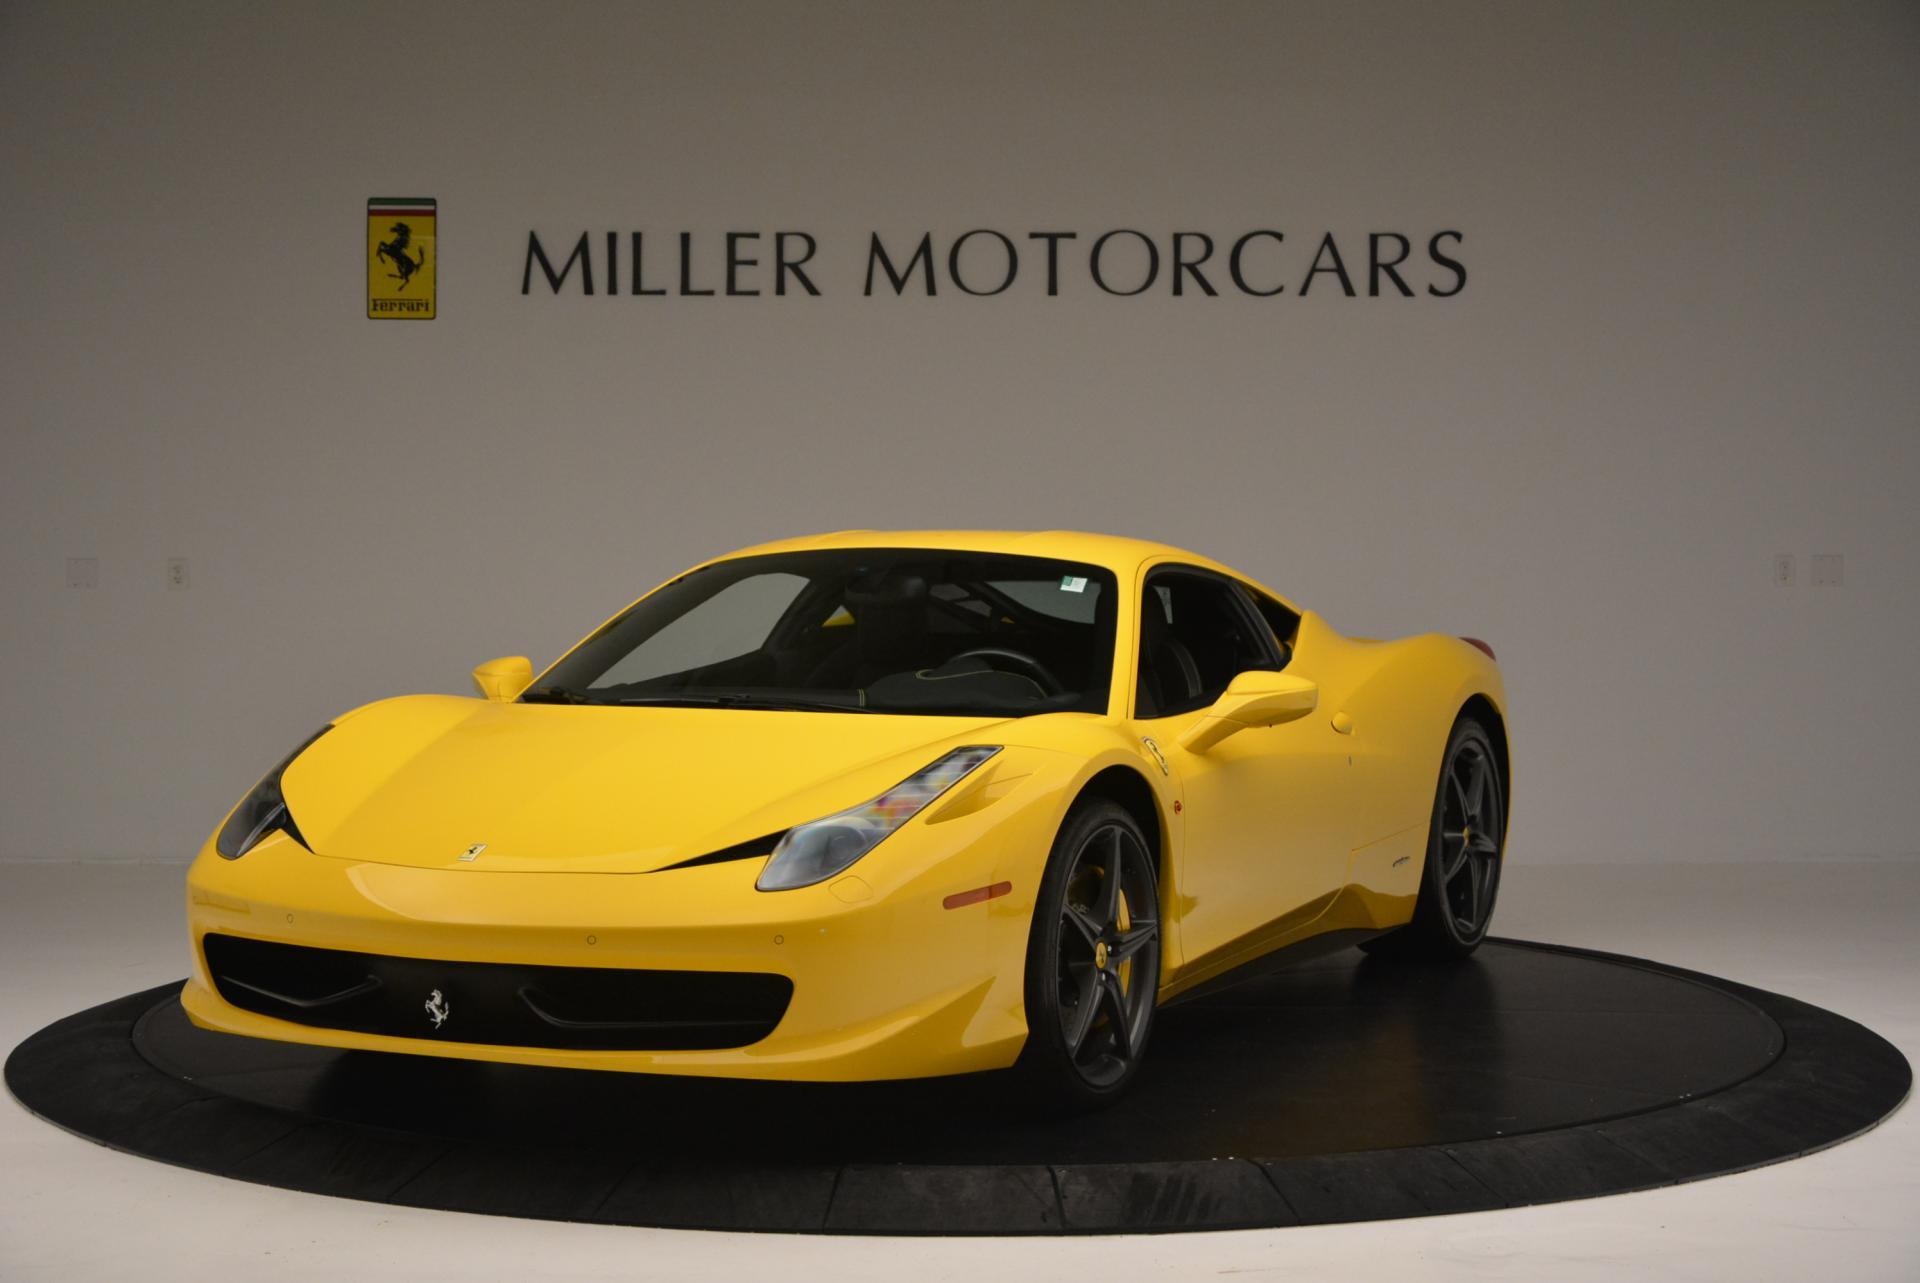 Used 2011 Ferrari 458 Italia for sale Sold at Maserati of Westport in Westport CT 06880 1